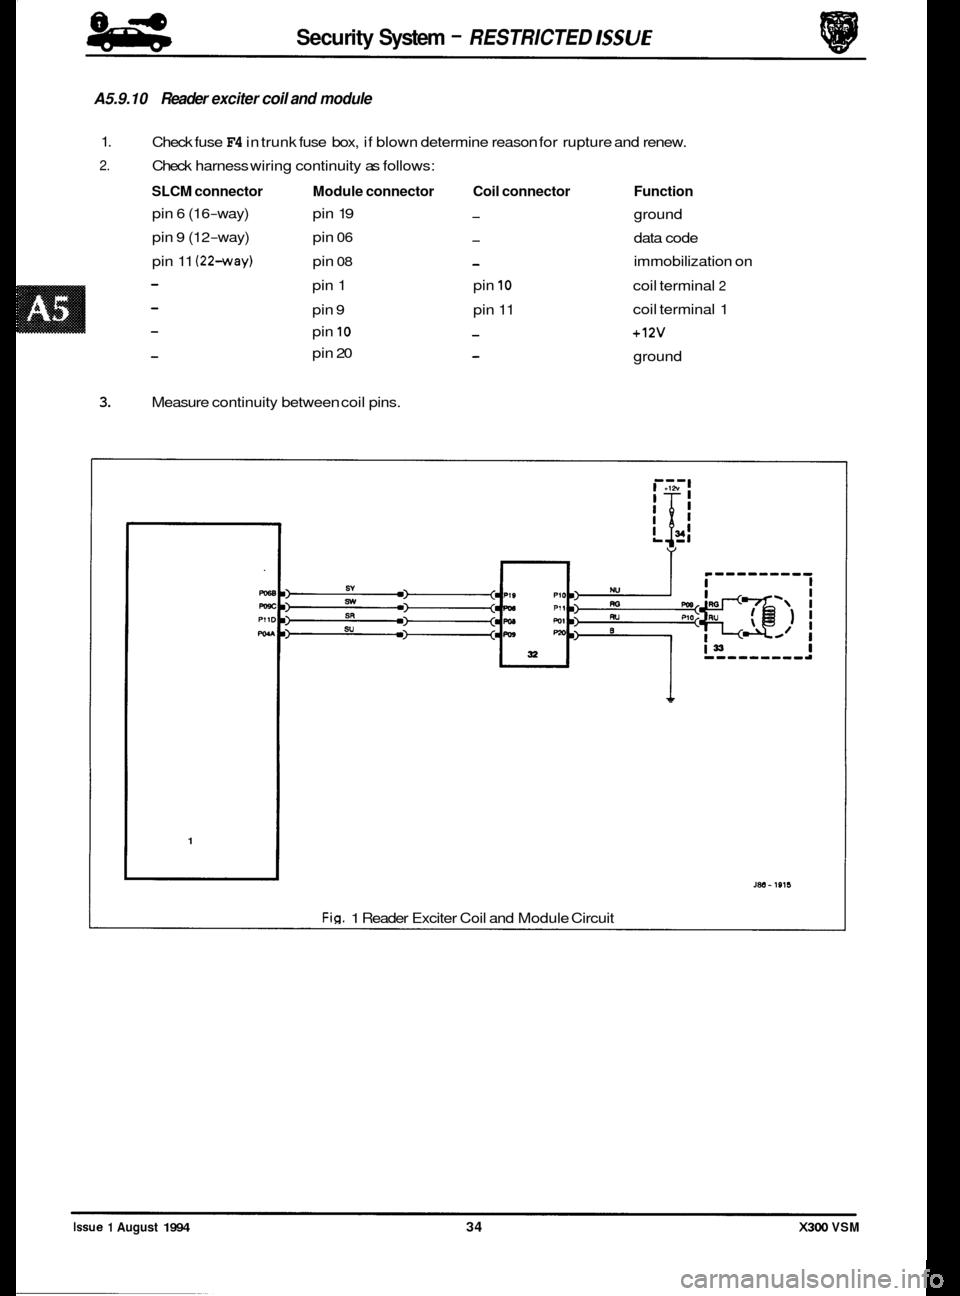 1994 Jaguar Xj6 Linkage Diagram Electrical Wiring Diagrams 1982 2 G Workshop Manual X300